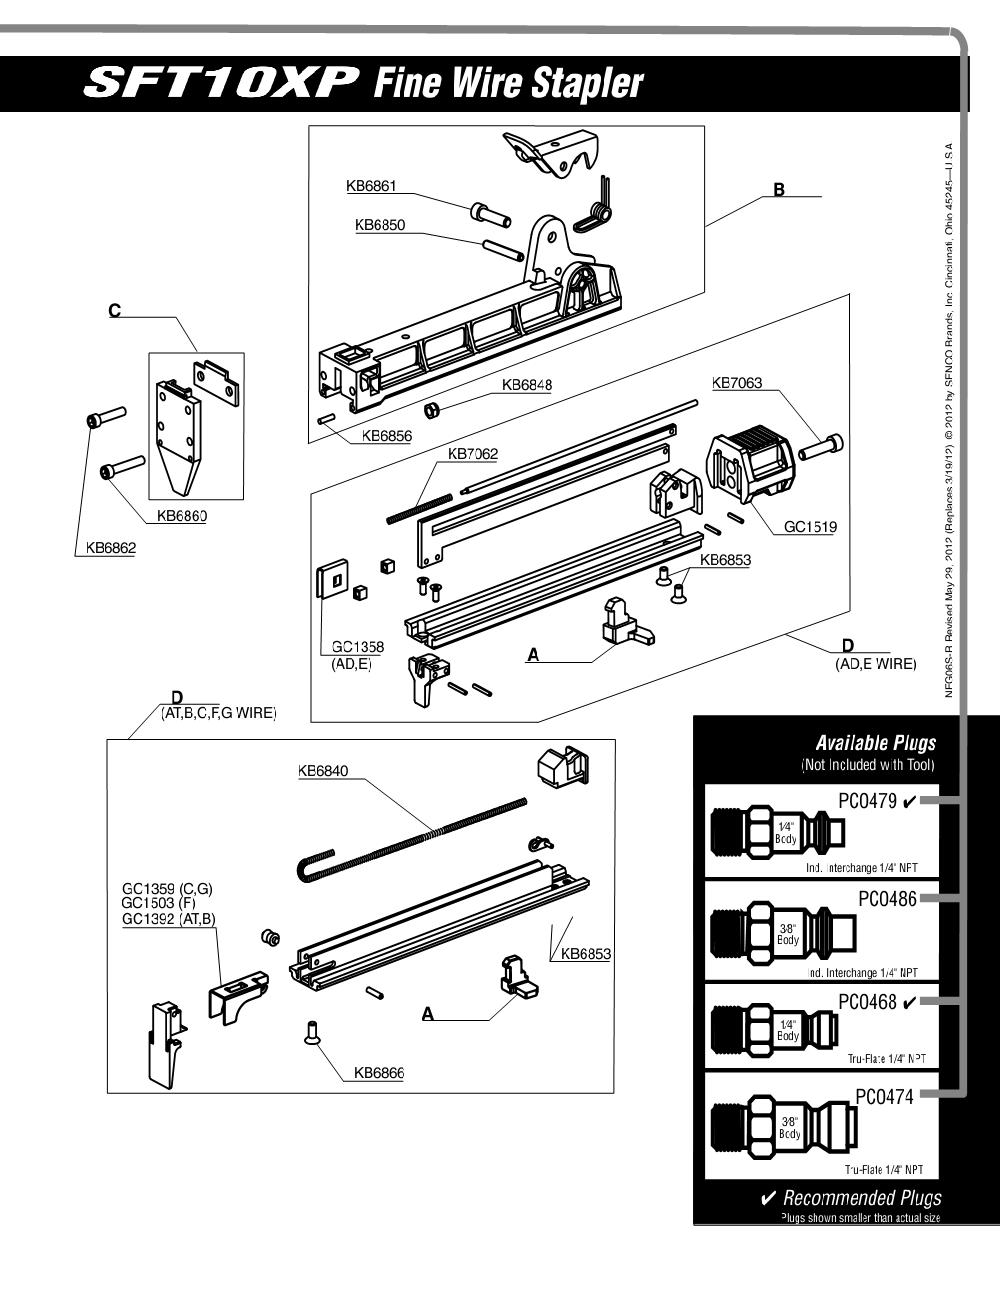 6S0051N-senco-PB-1Break Down